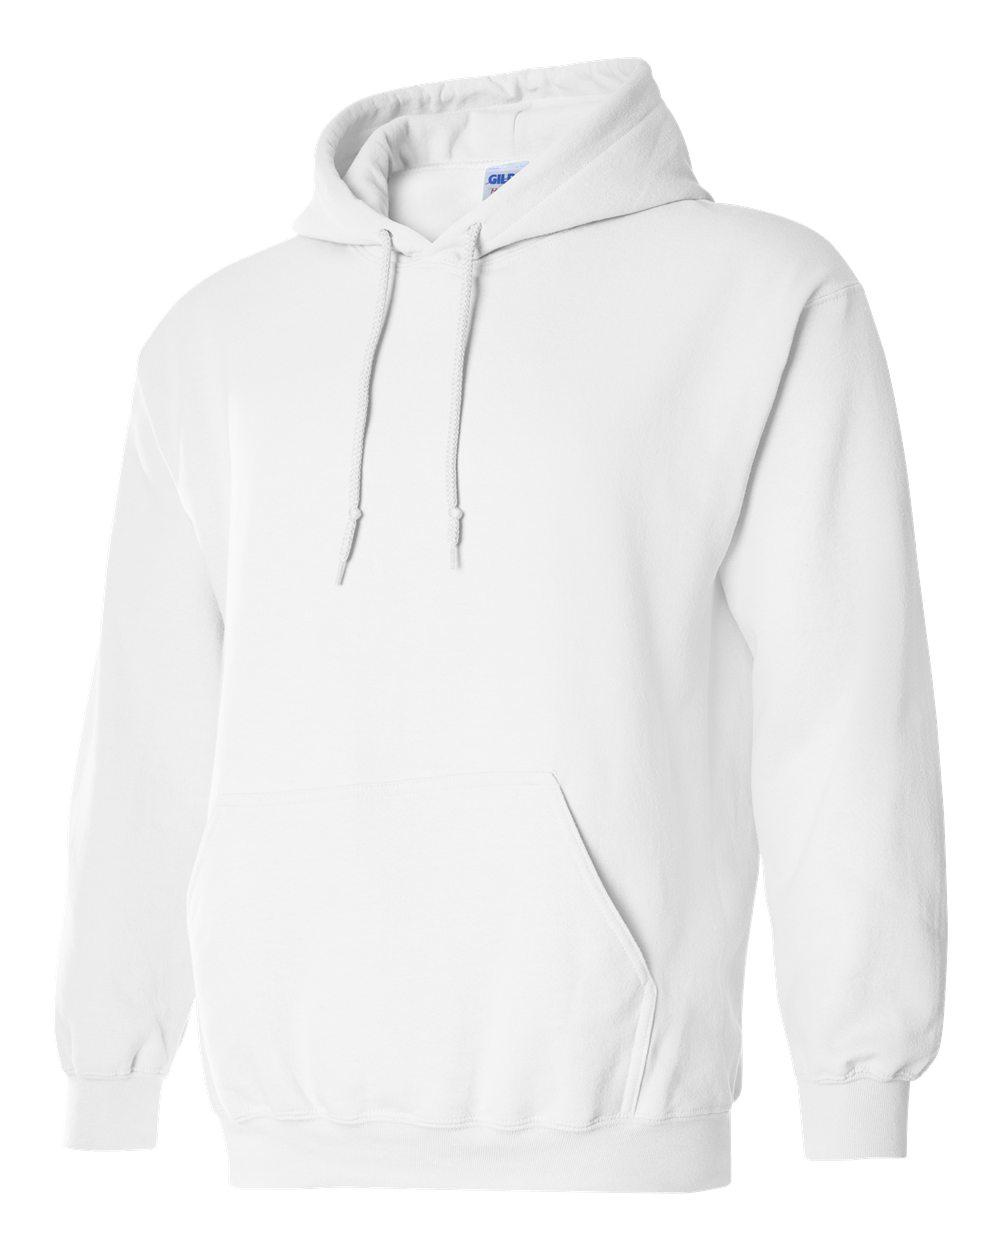 Gildan Heavy Blend Hooded Sweatshirt GI18500 White